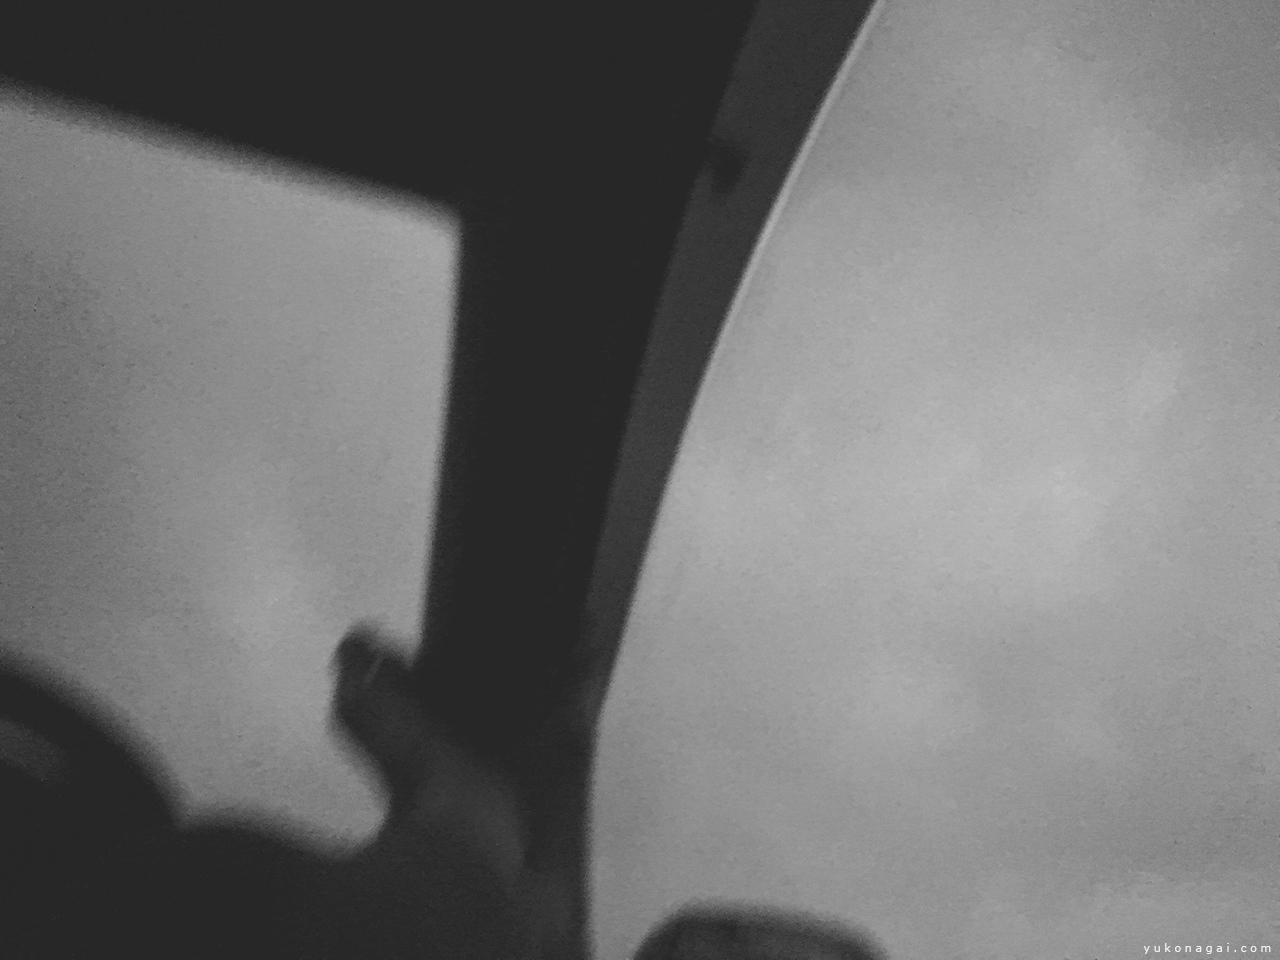 Cloudy sky through a driver seat.